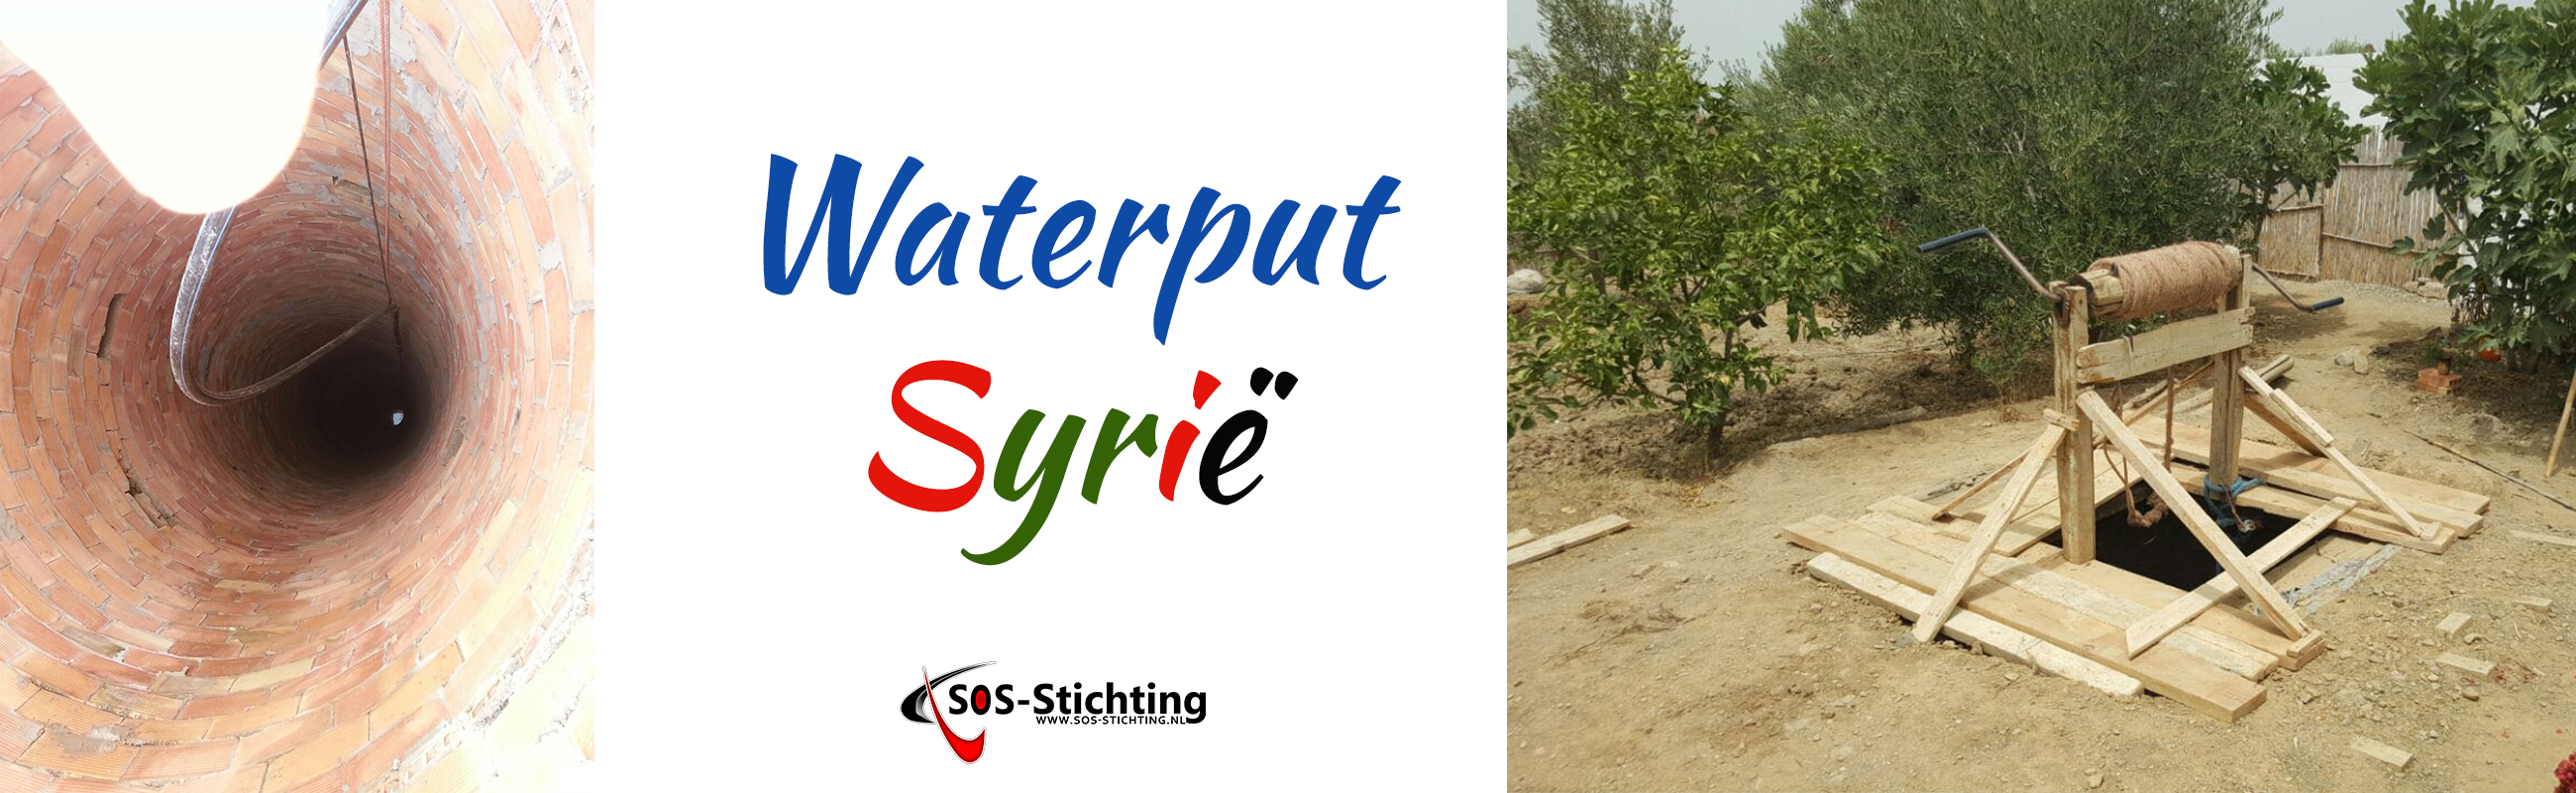 Gratis dating sites Syrië